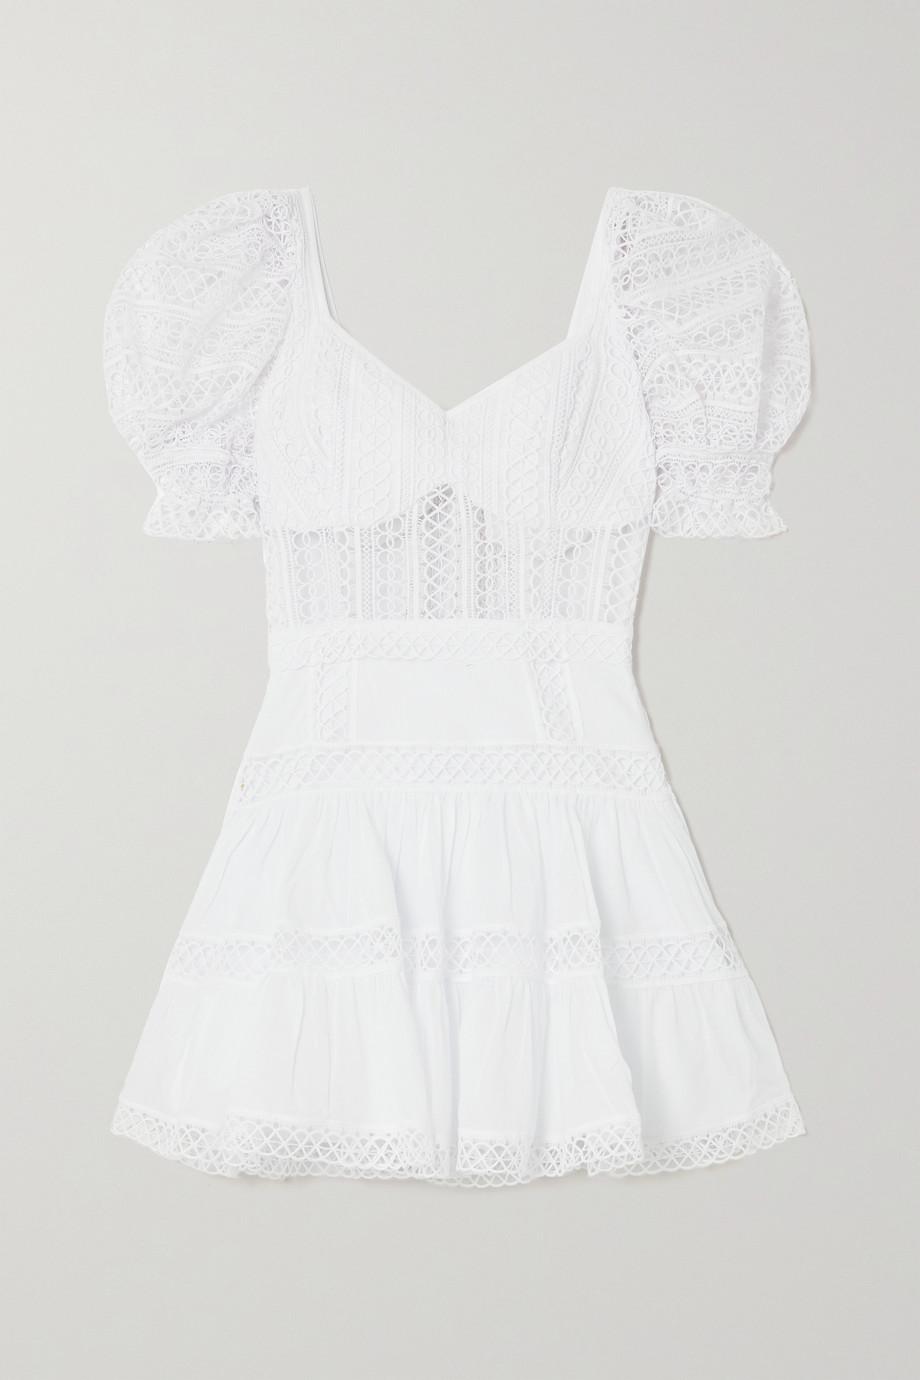 Charo Ruiz Katharine guipure lace and cotton-blend voile mini dress